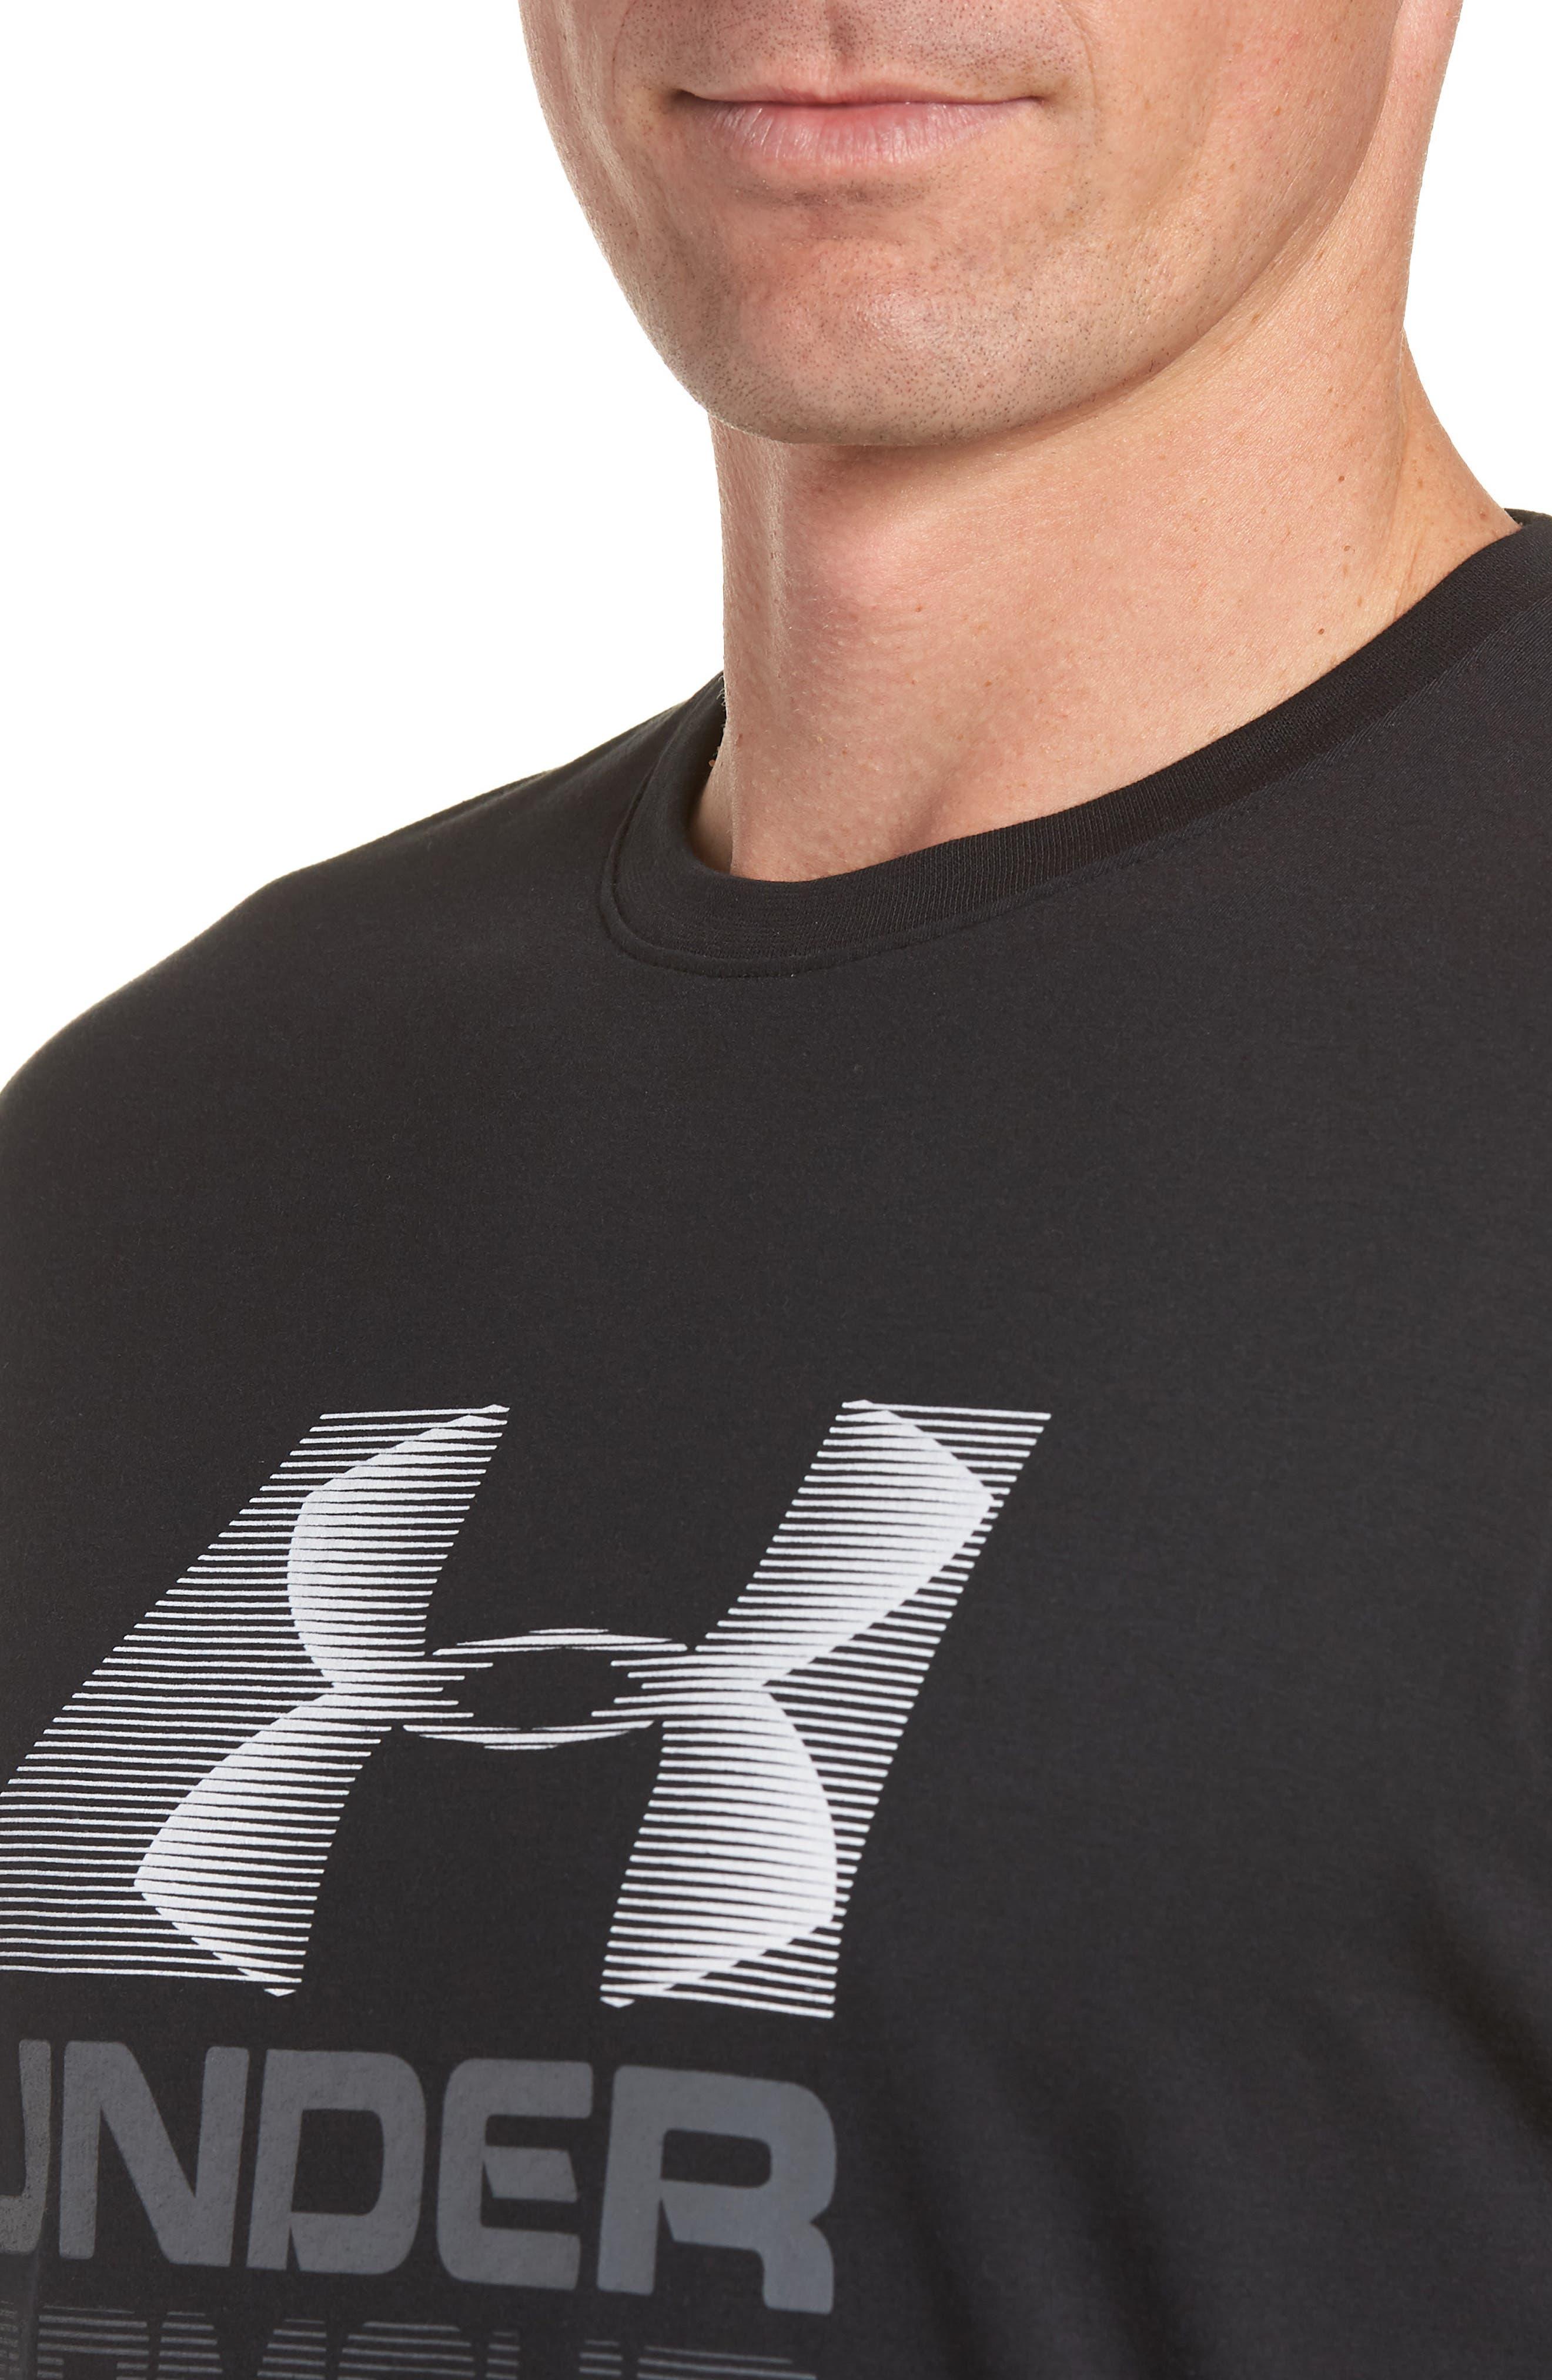 Trim Fit Vanish Logo T-Shirt,                             Alternate thumbnail 4, color,                             BLACK/ WHITE/ GRAPHITE